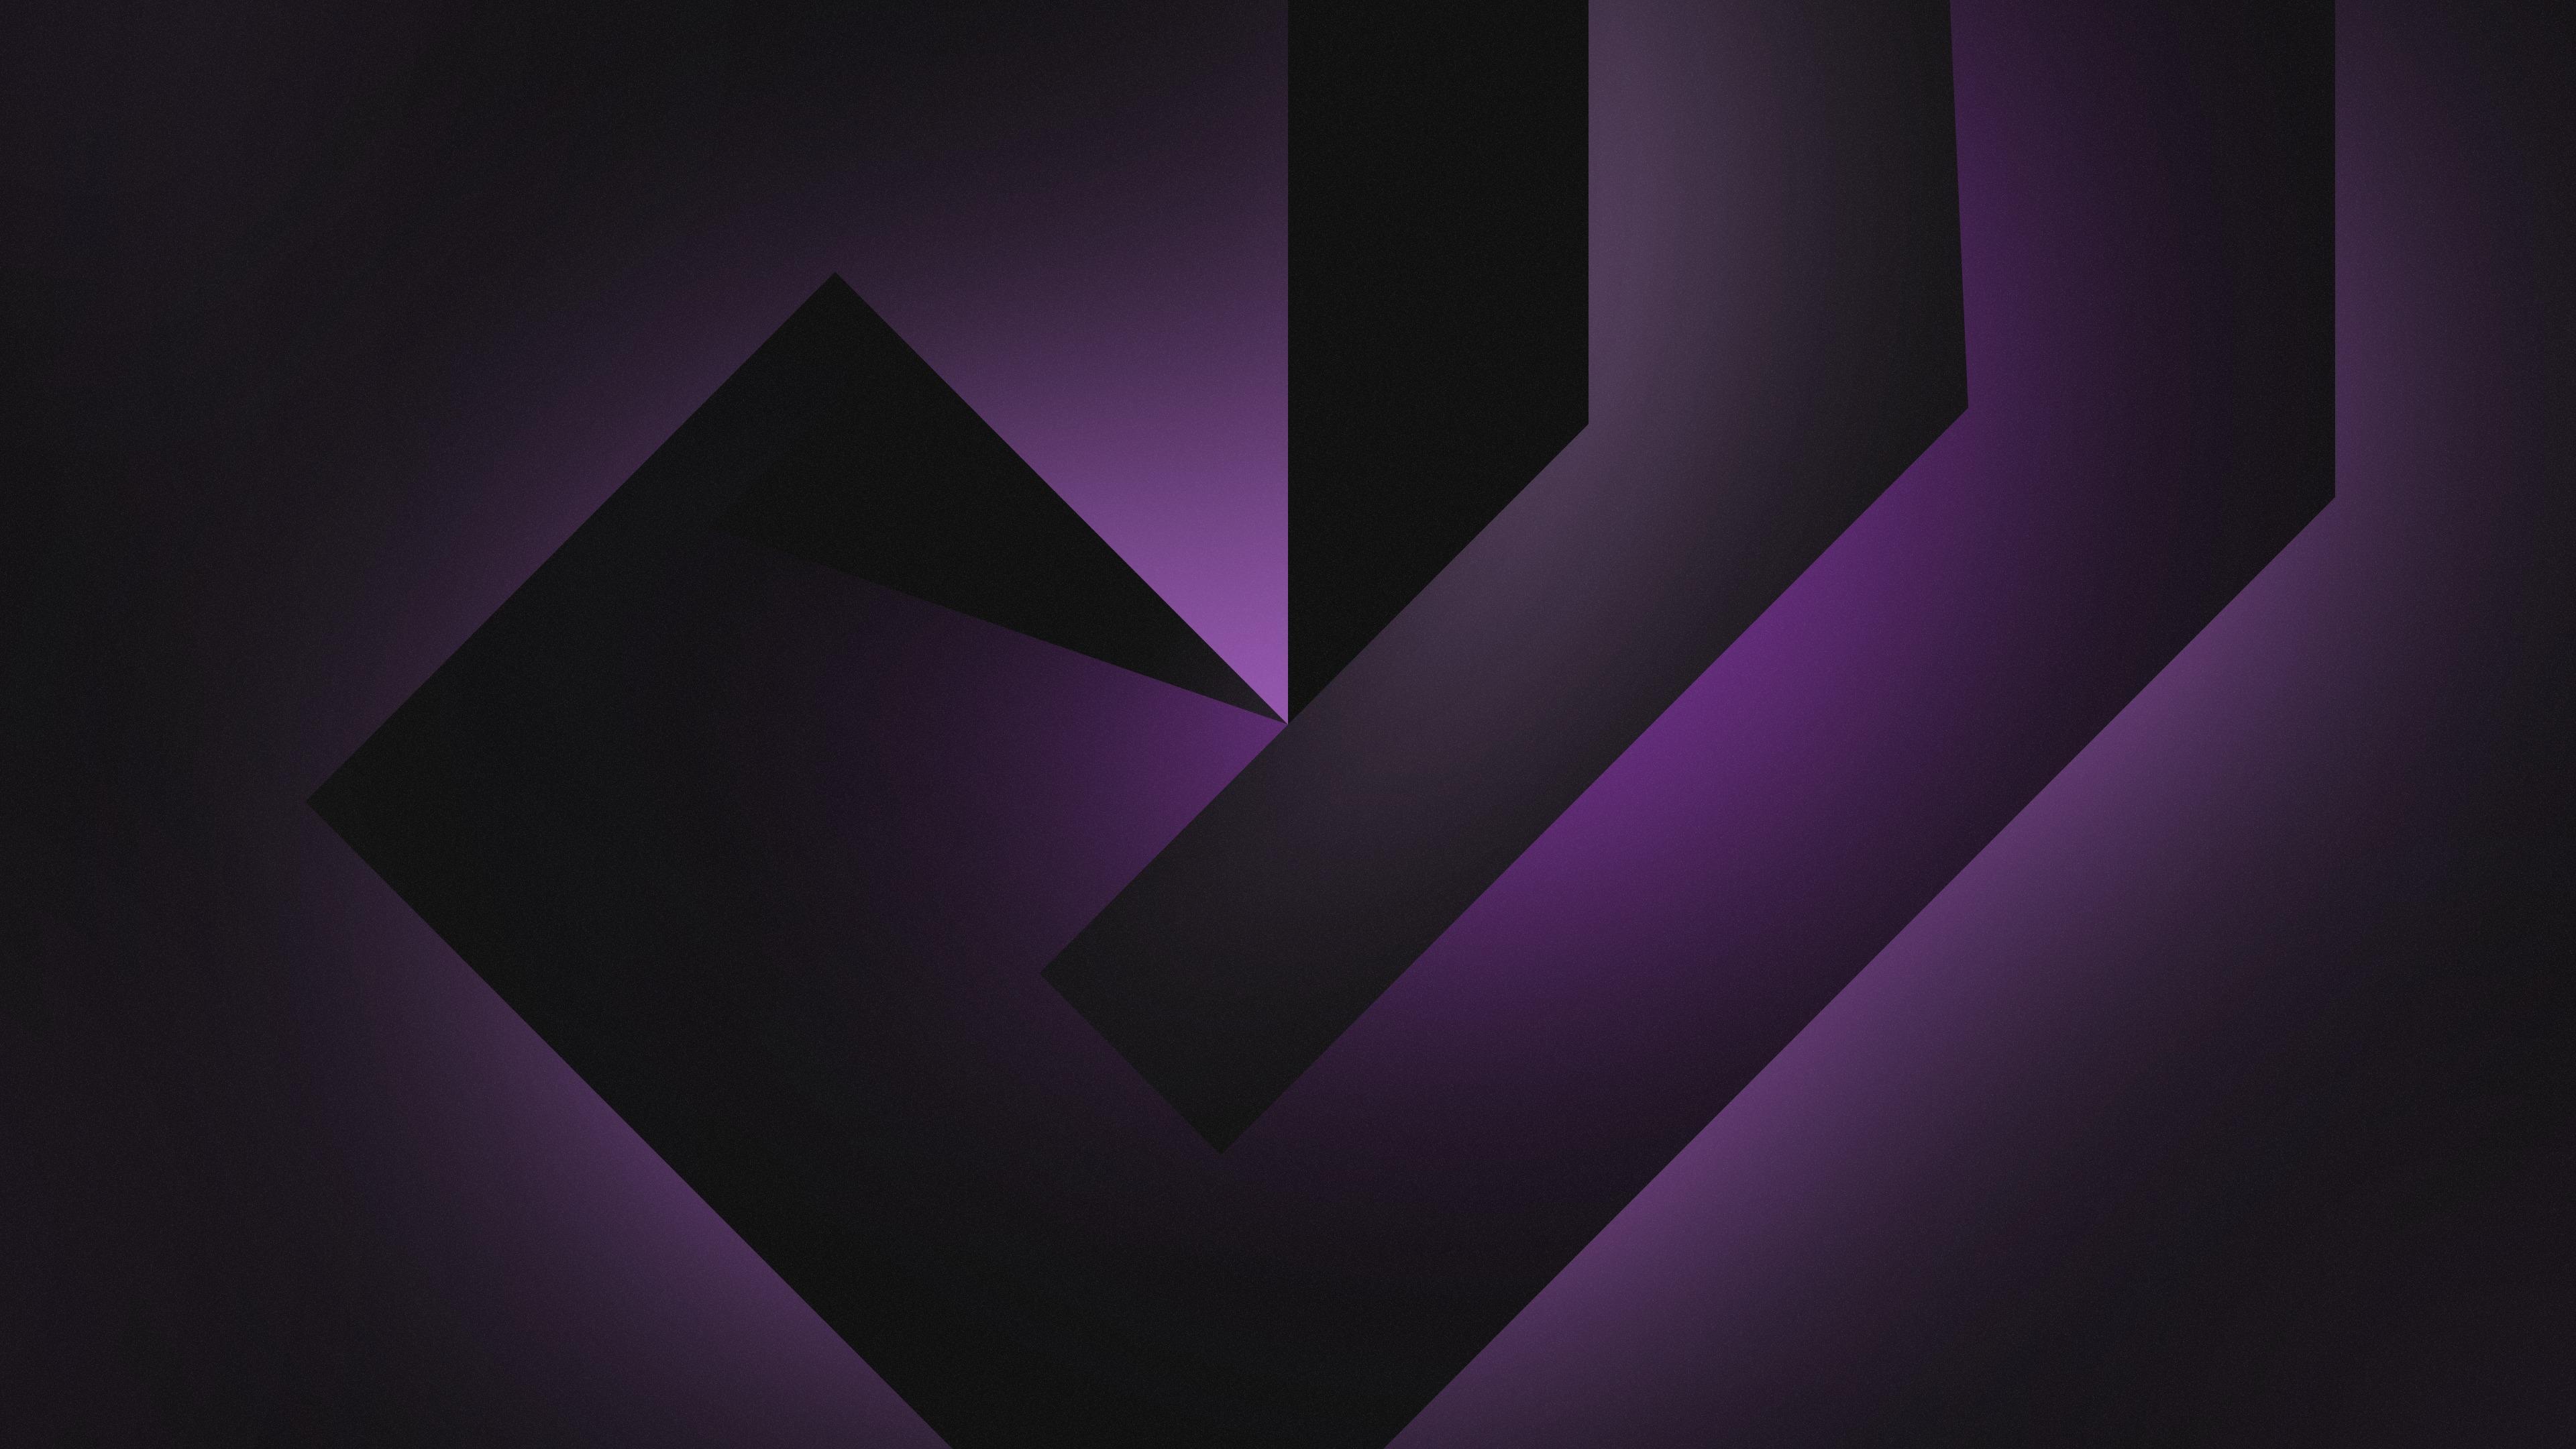 16 Luxury Pubg Wallpaper Iphone 6: 1080x1920 Violet Geometric Dark Shapes Iphone 7, 6s, 6